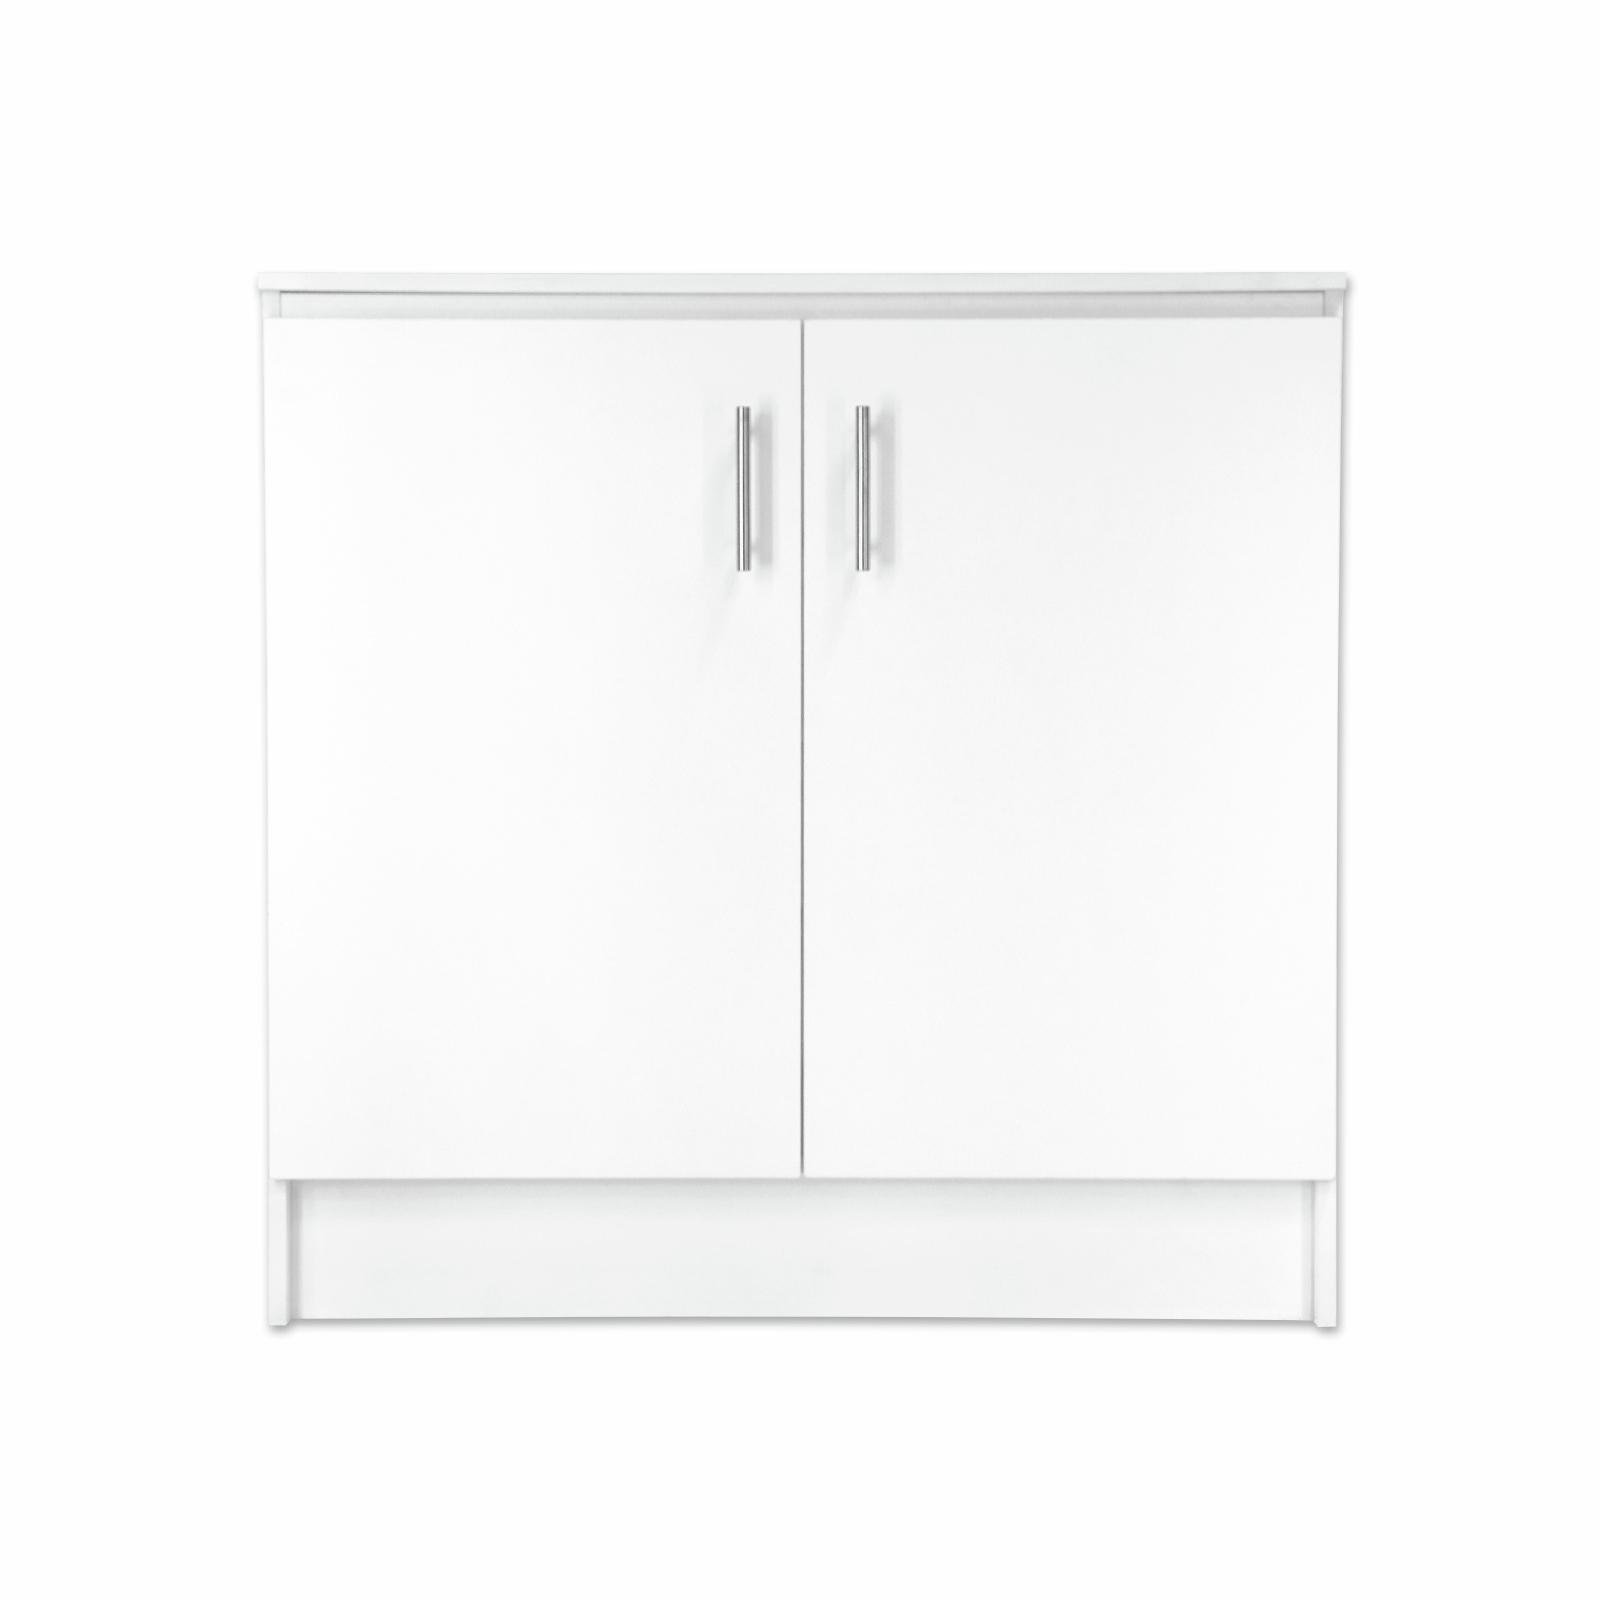 Bedford 900mm White 2 Door High Moisture Resistant Base Slimline Cabinet